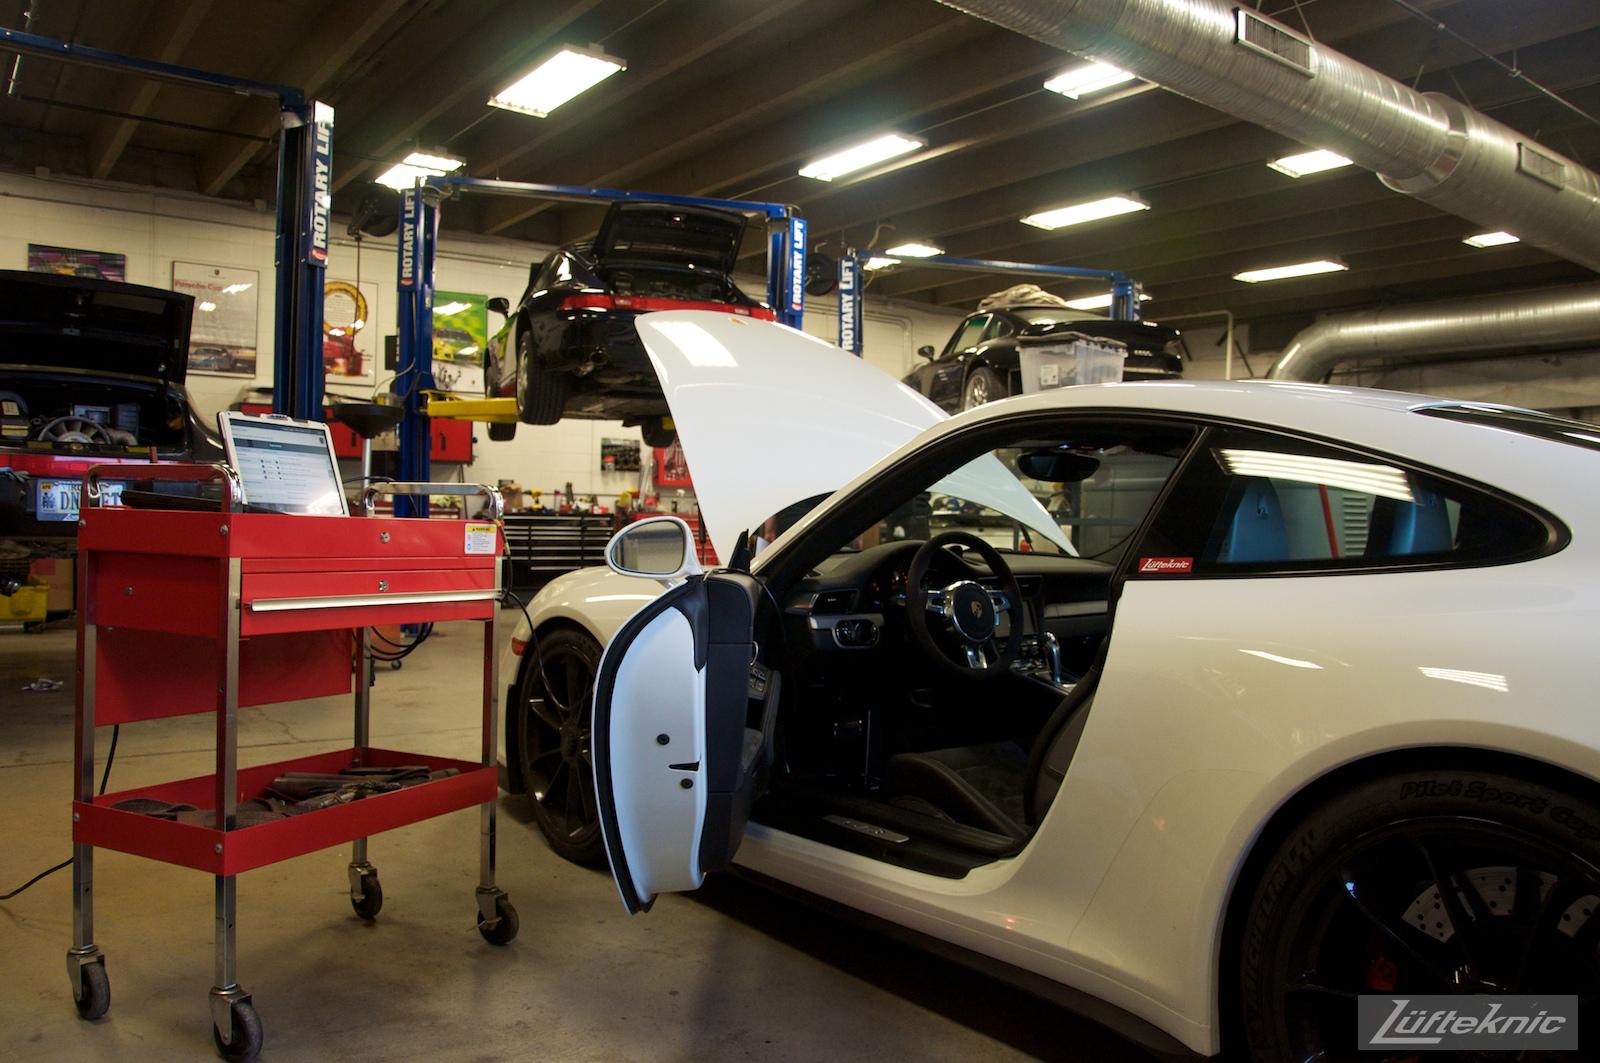 Lüfteknic Porsche 991 GT3 getting the computer / DME scanned.